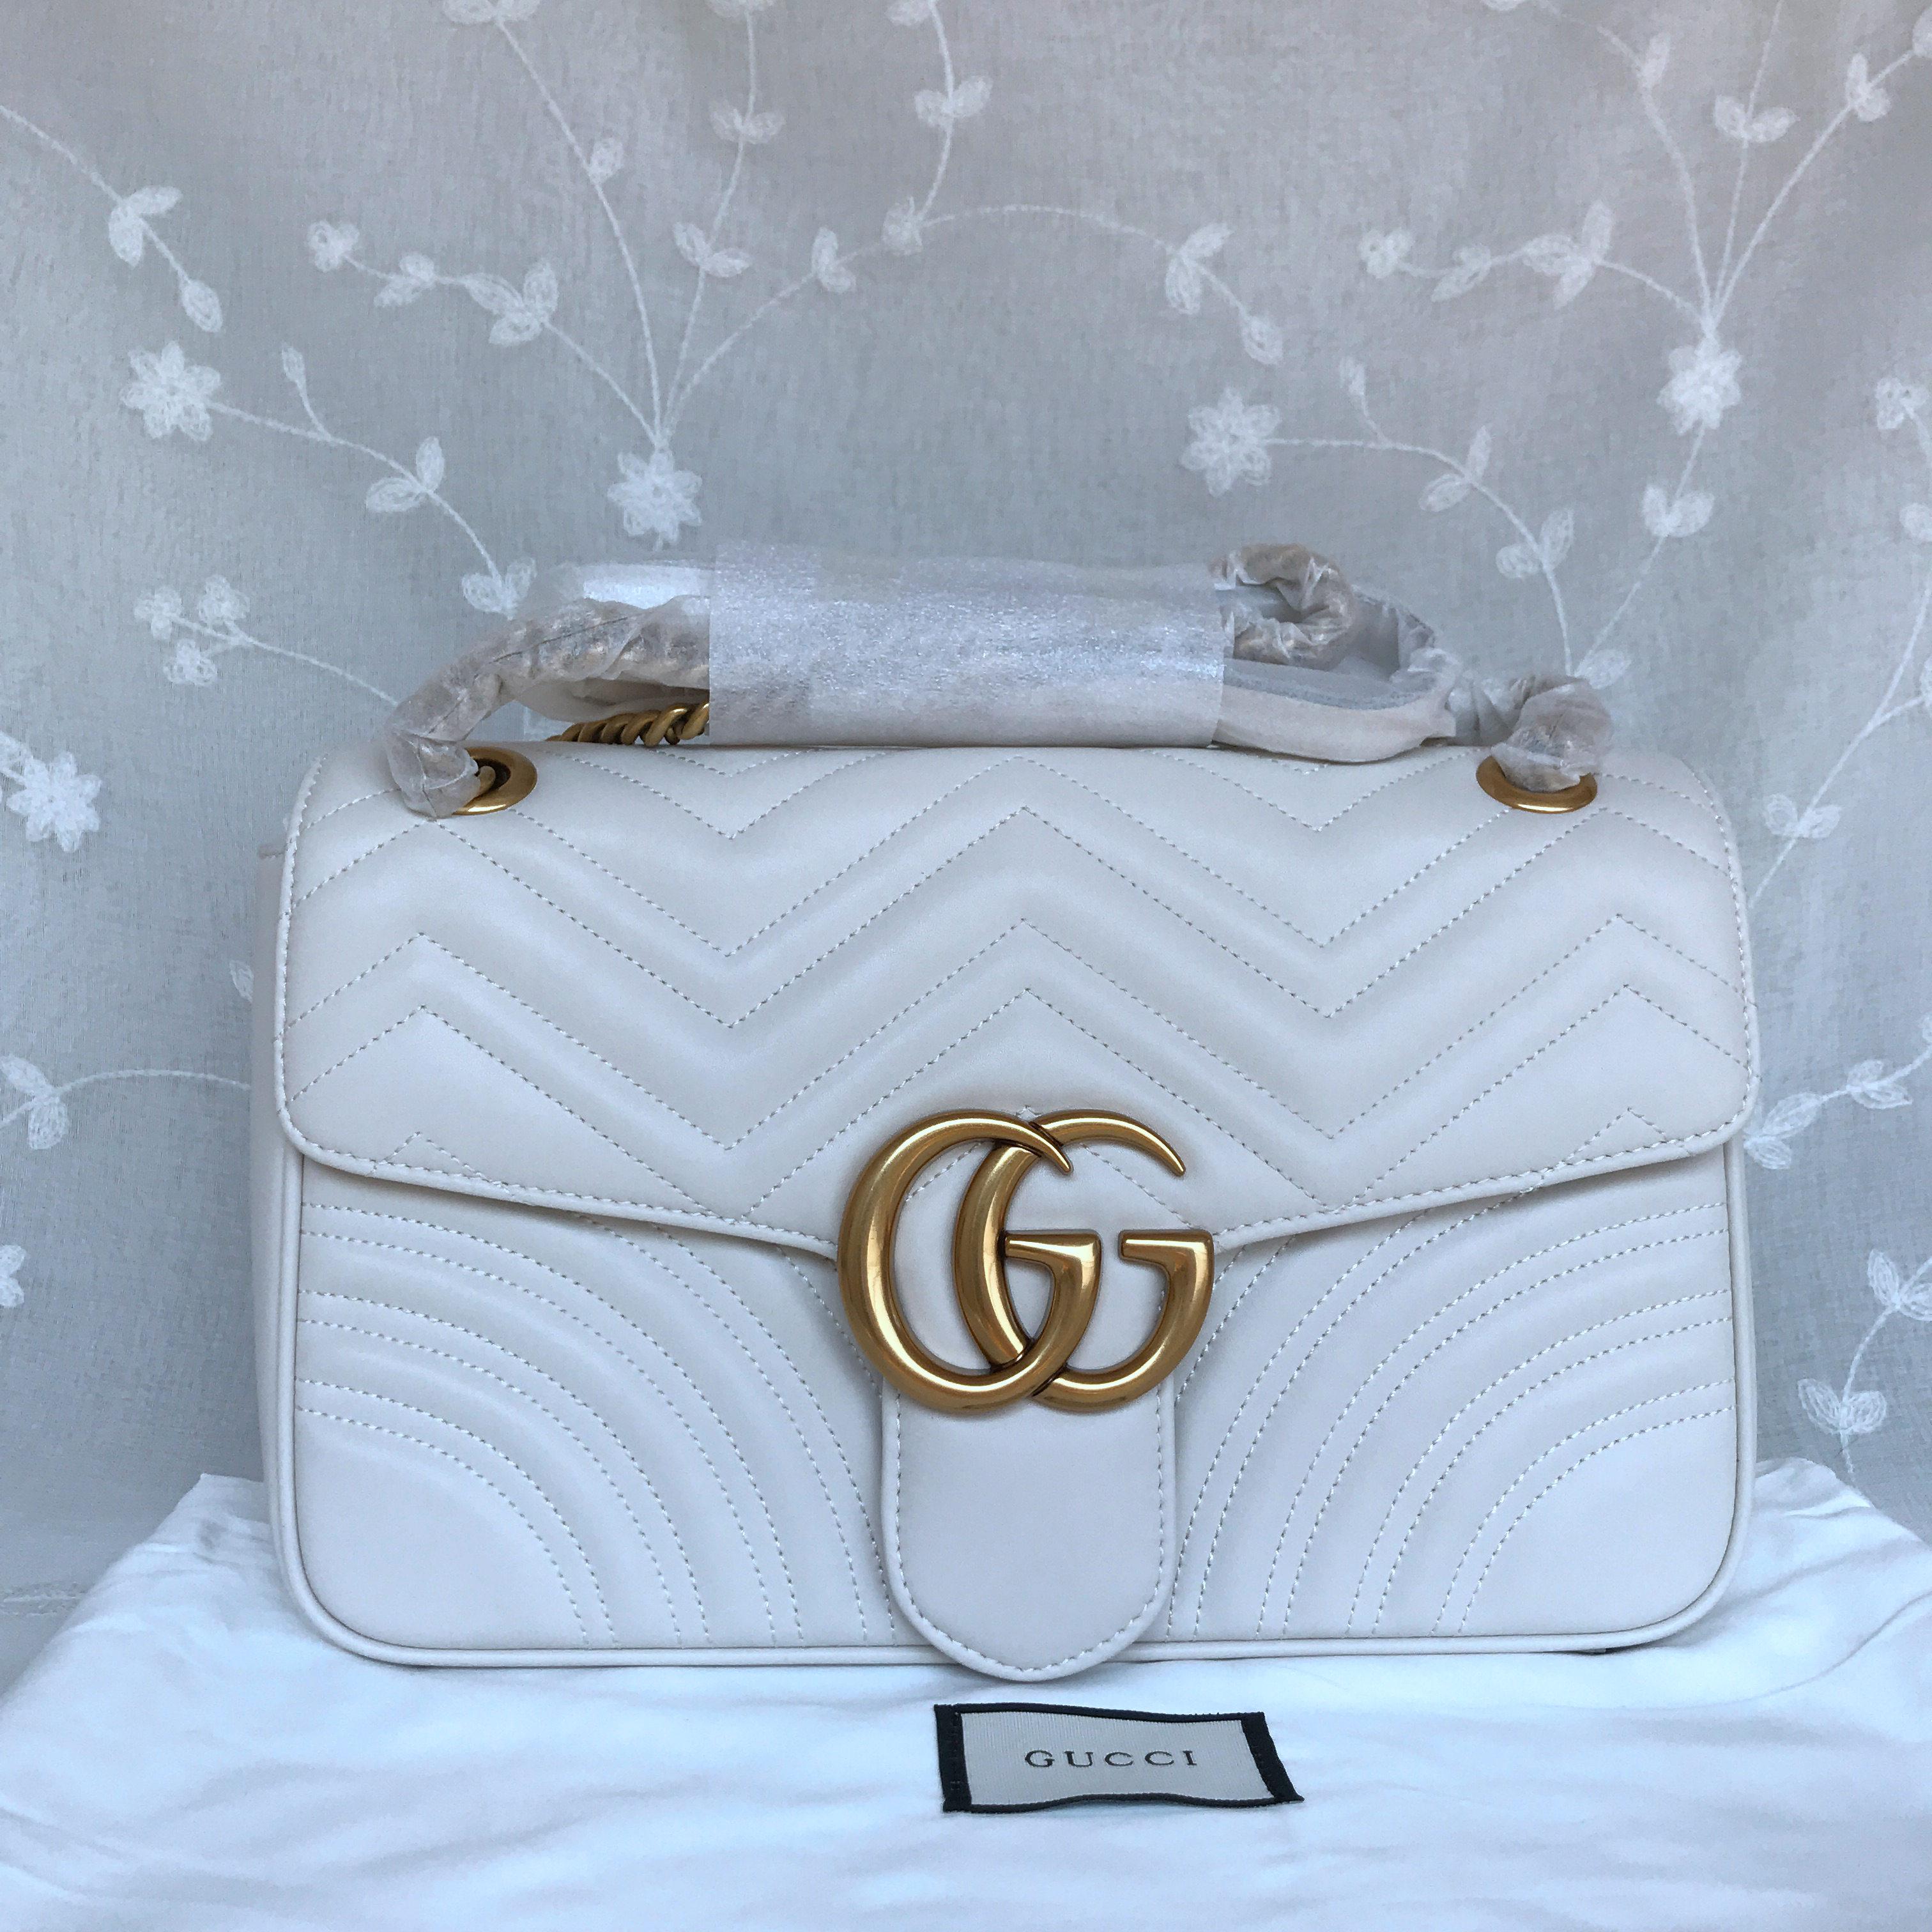 Gucci Marmont medium matelasse shoulder Bag 443496